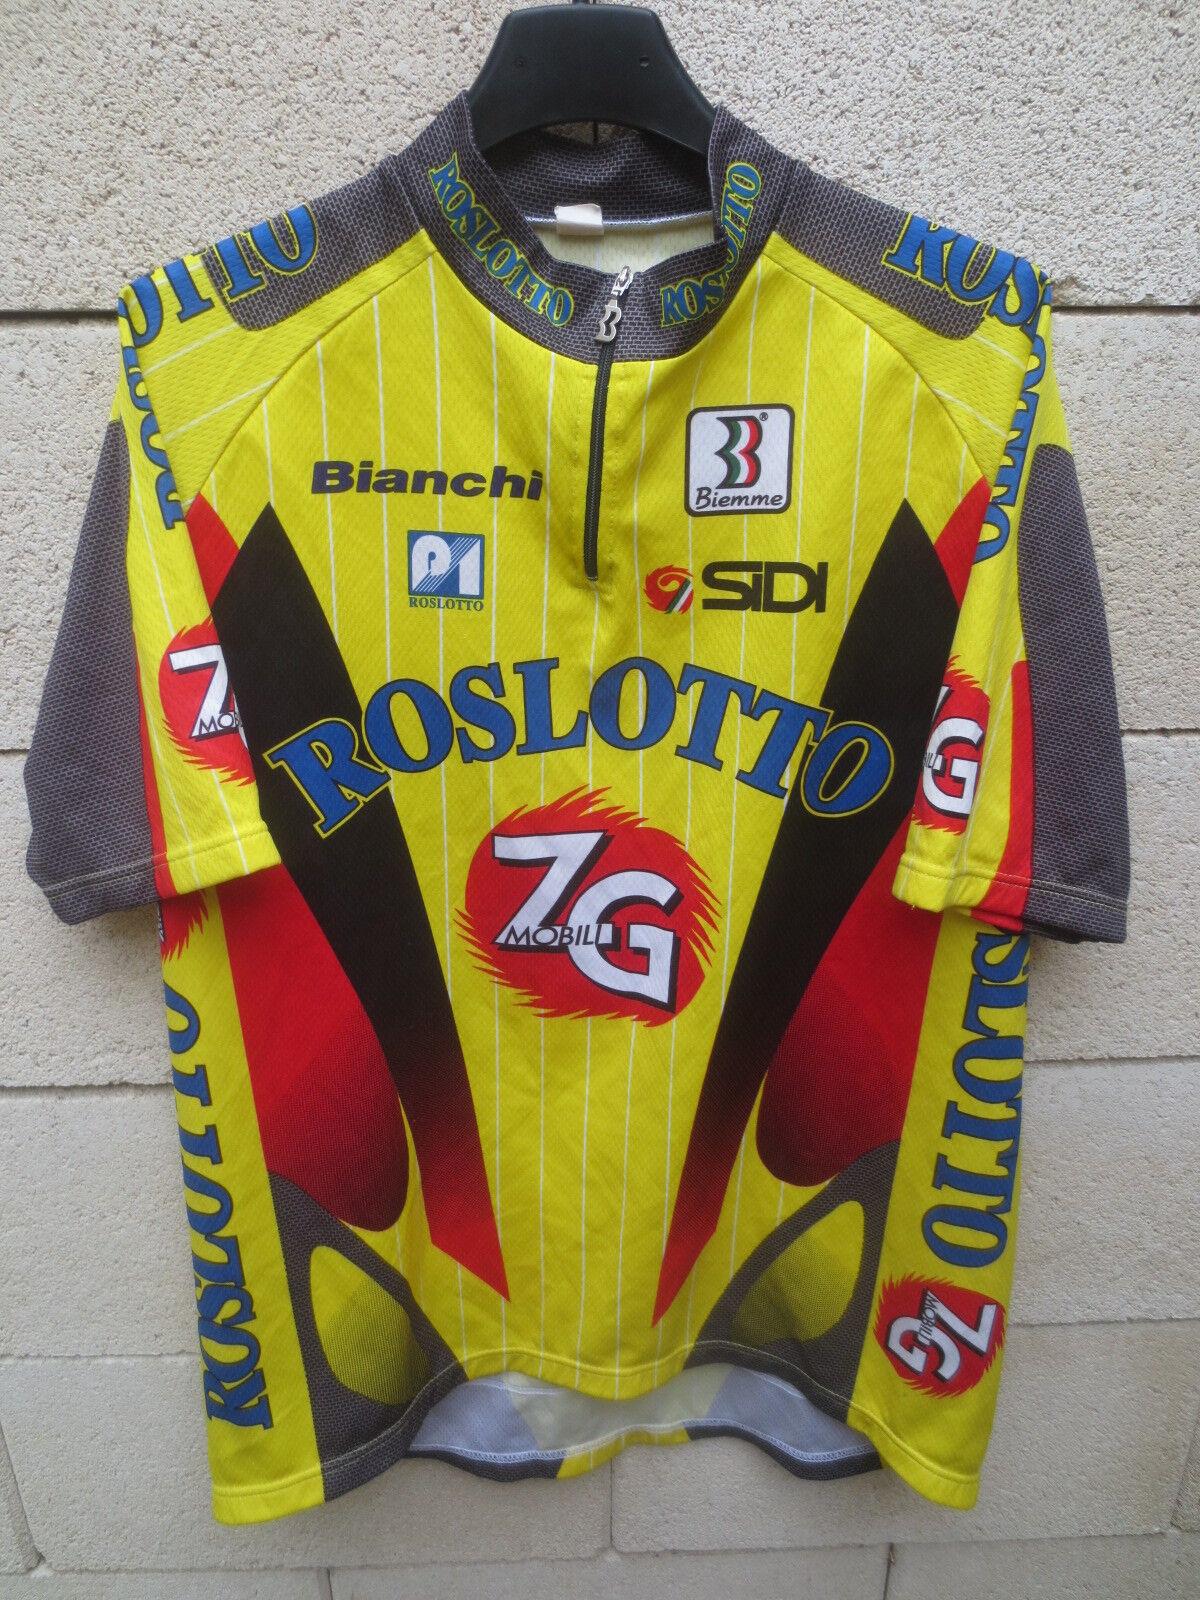 Maillot cycliste ROSLOTTO ZG MOBILI Tour de  France 1997 cycling shirt trikot XL  sales online